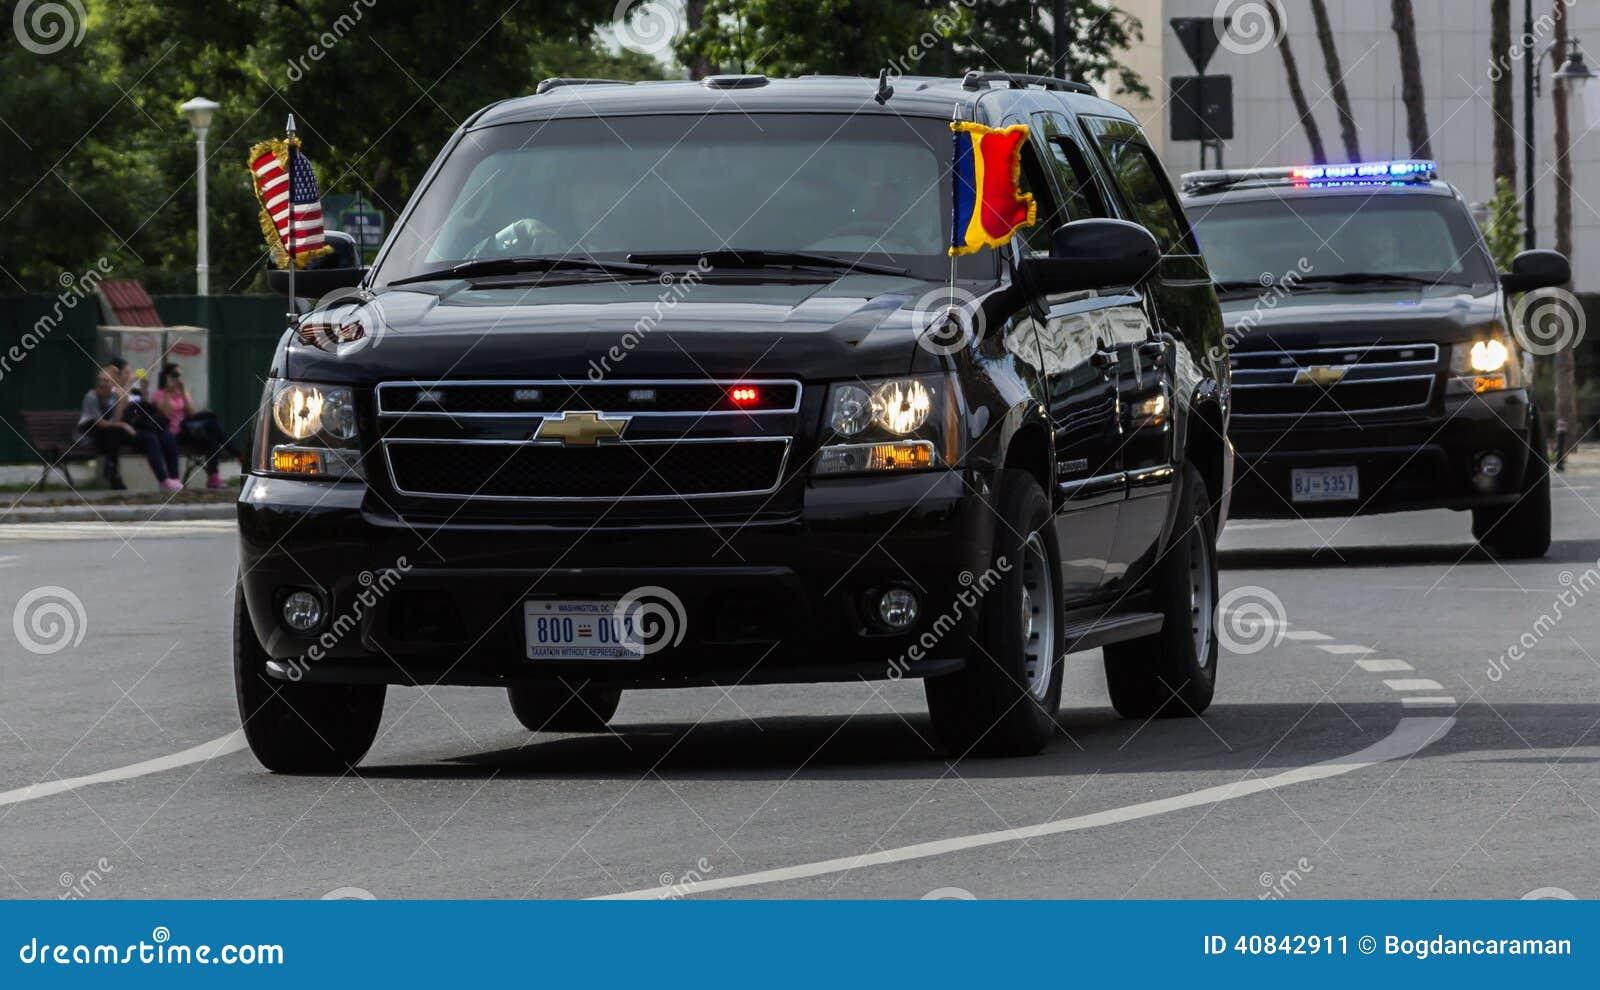 Tajna Służba pojazd